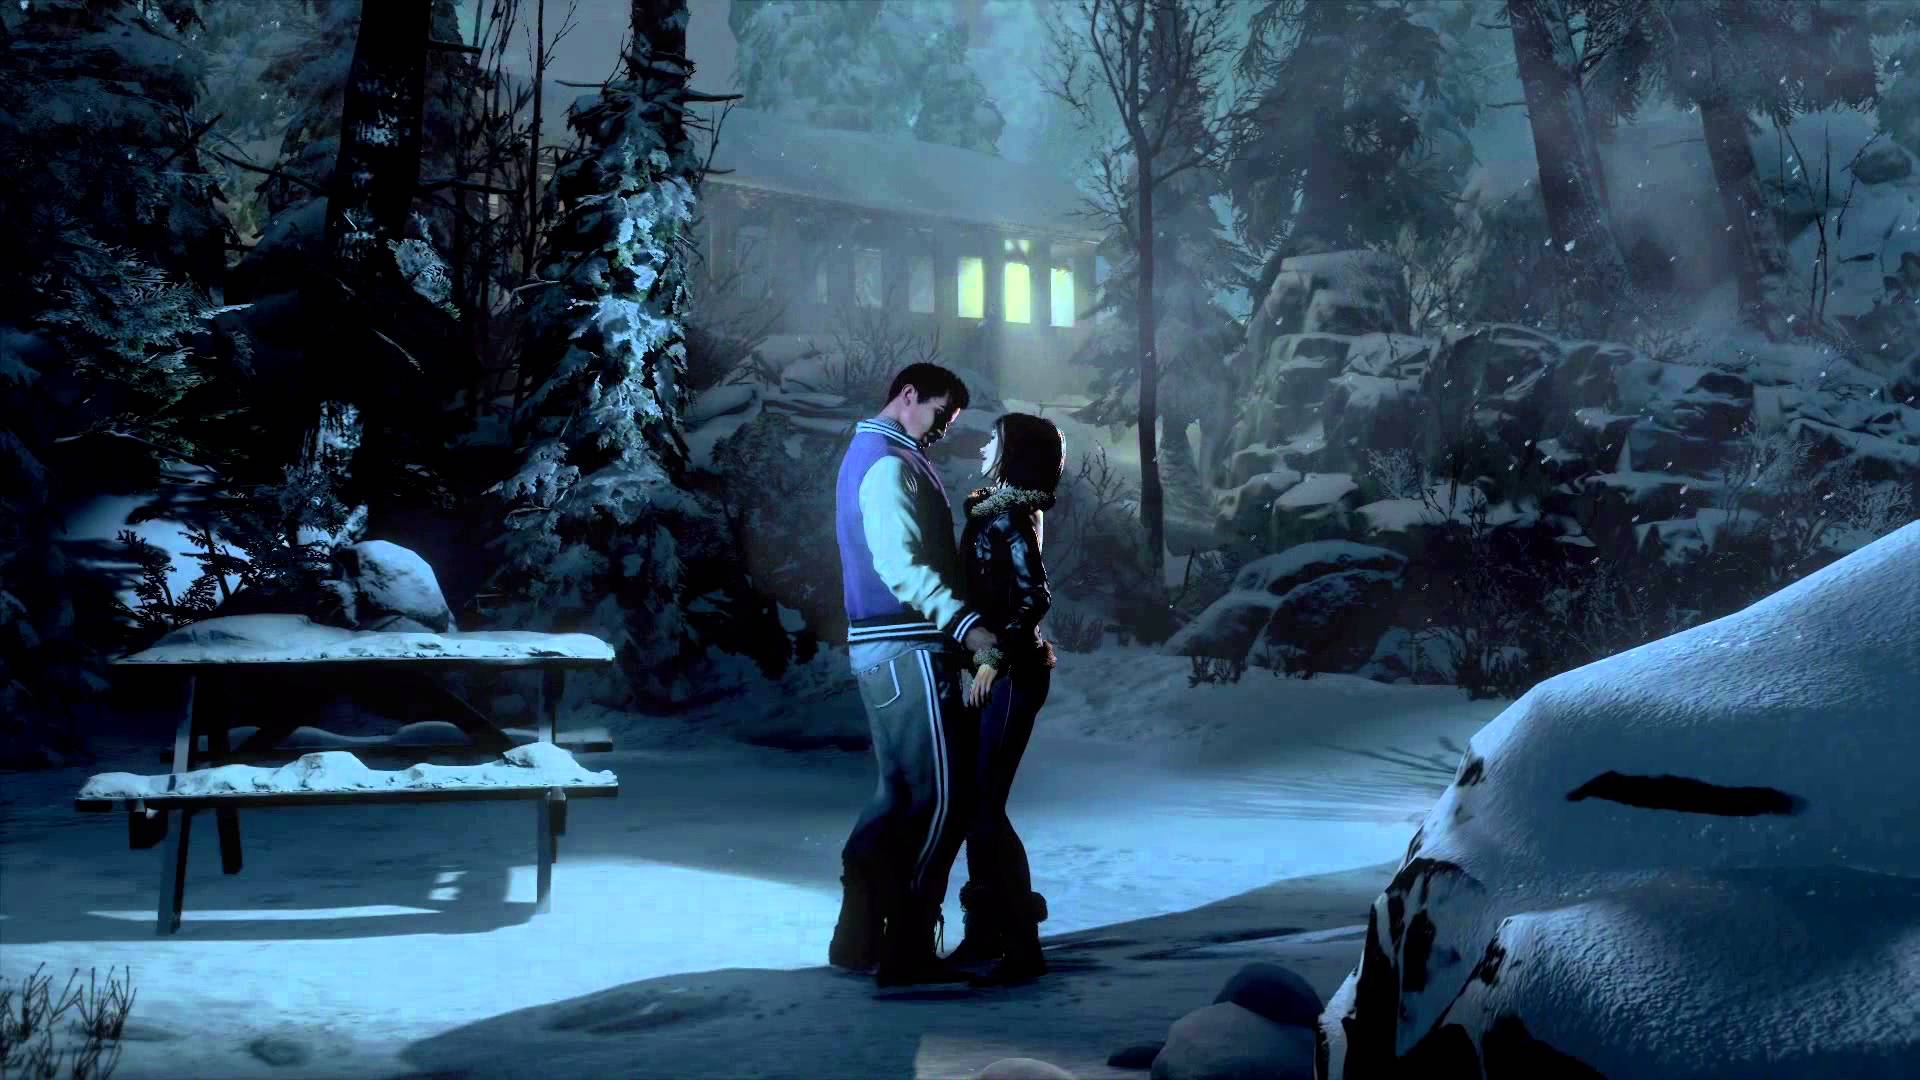 Gravity Falls Hd Wallpaper 1080p 12 Hd Until Dawn Game Wallpapers